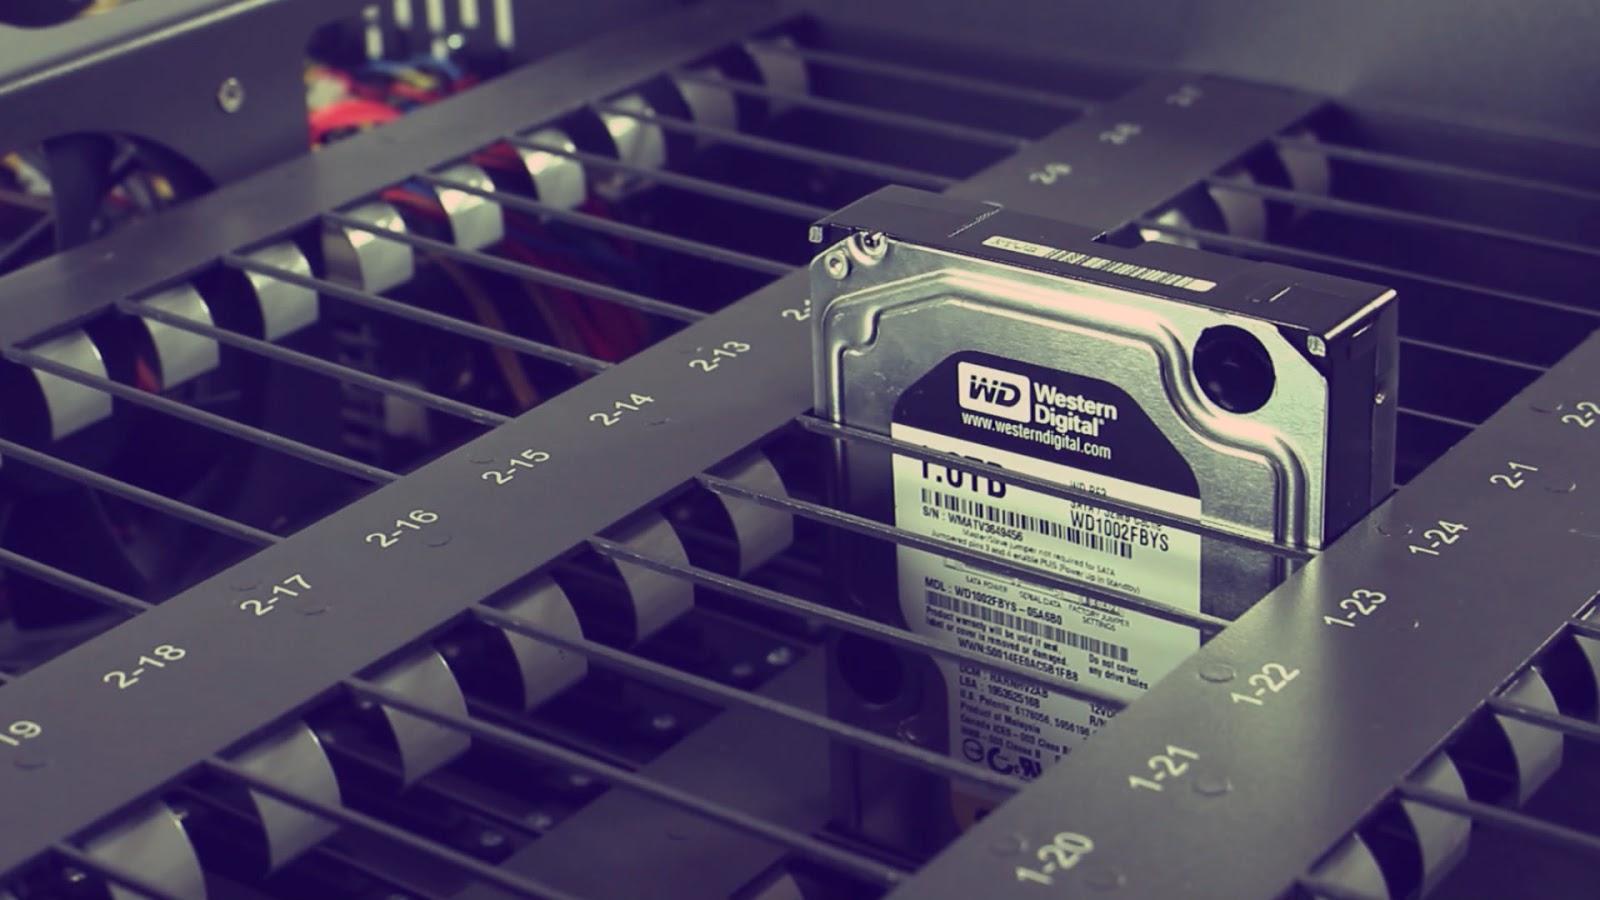 Magnetic tape data storage